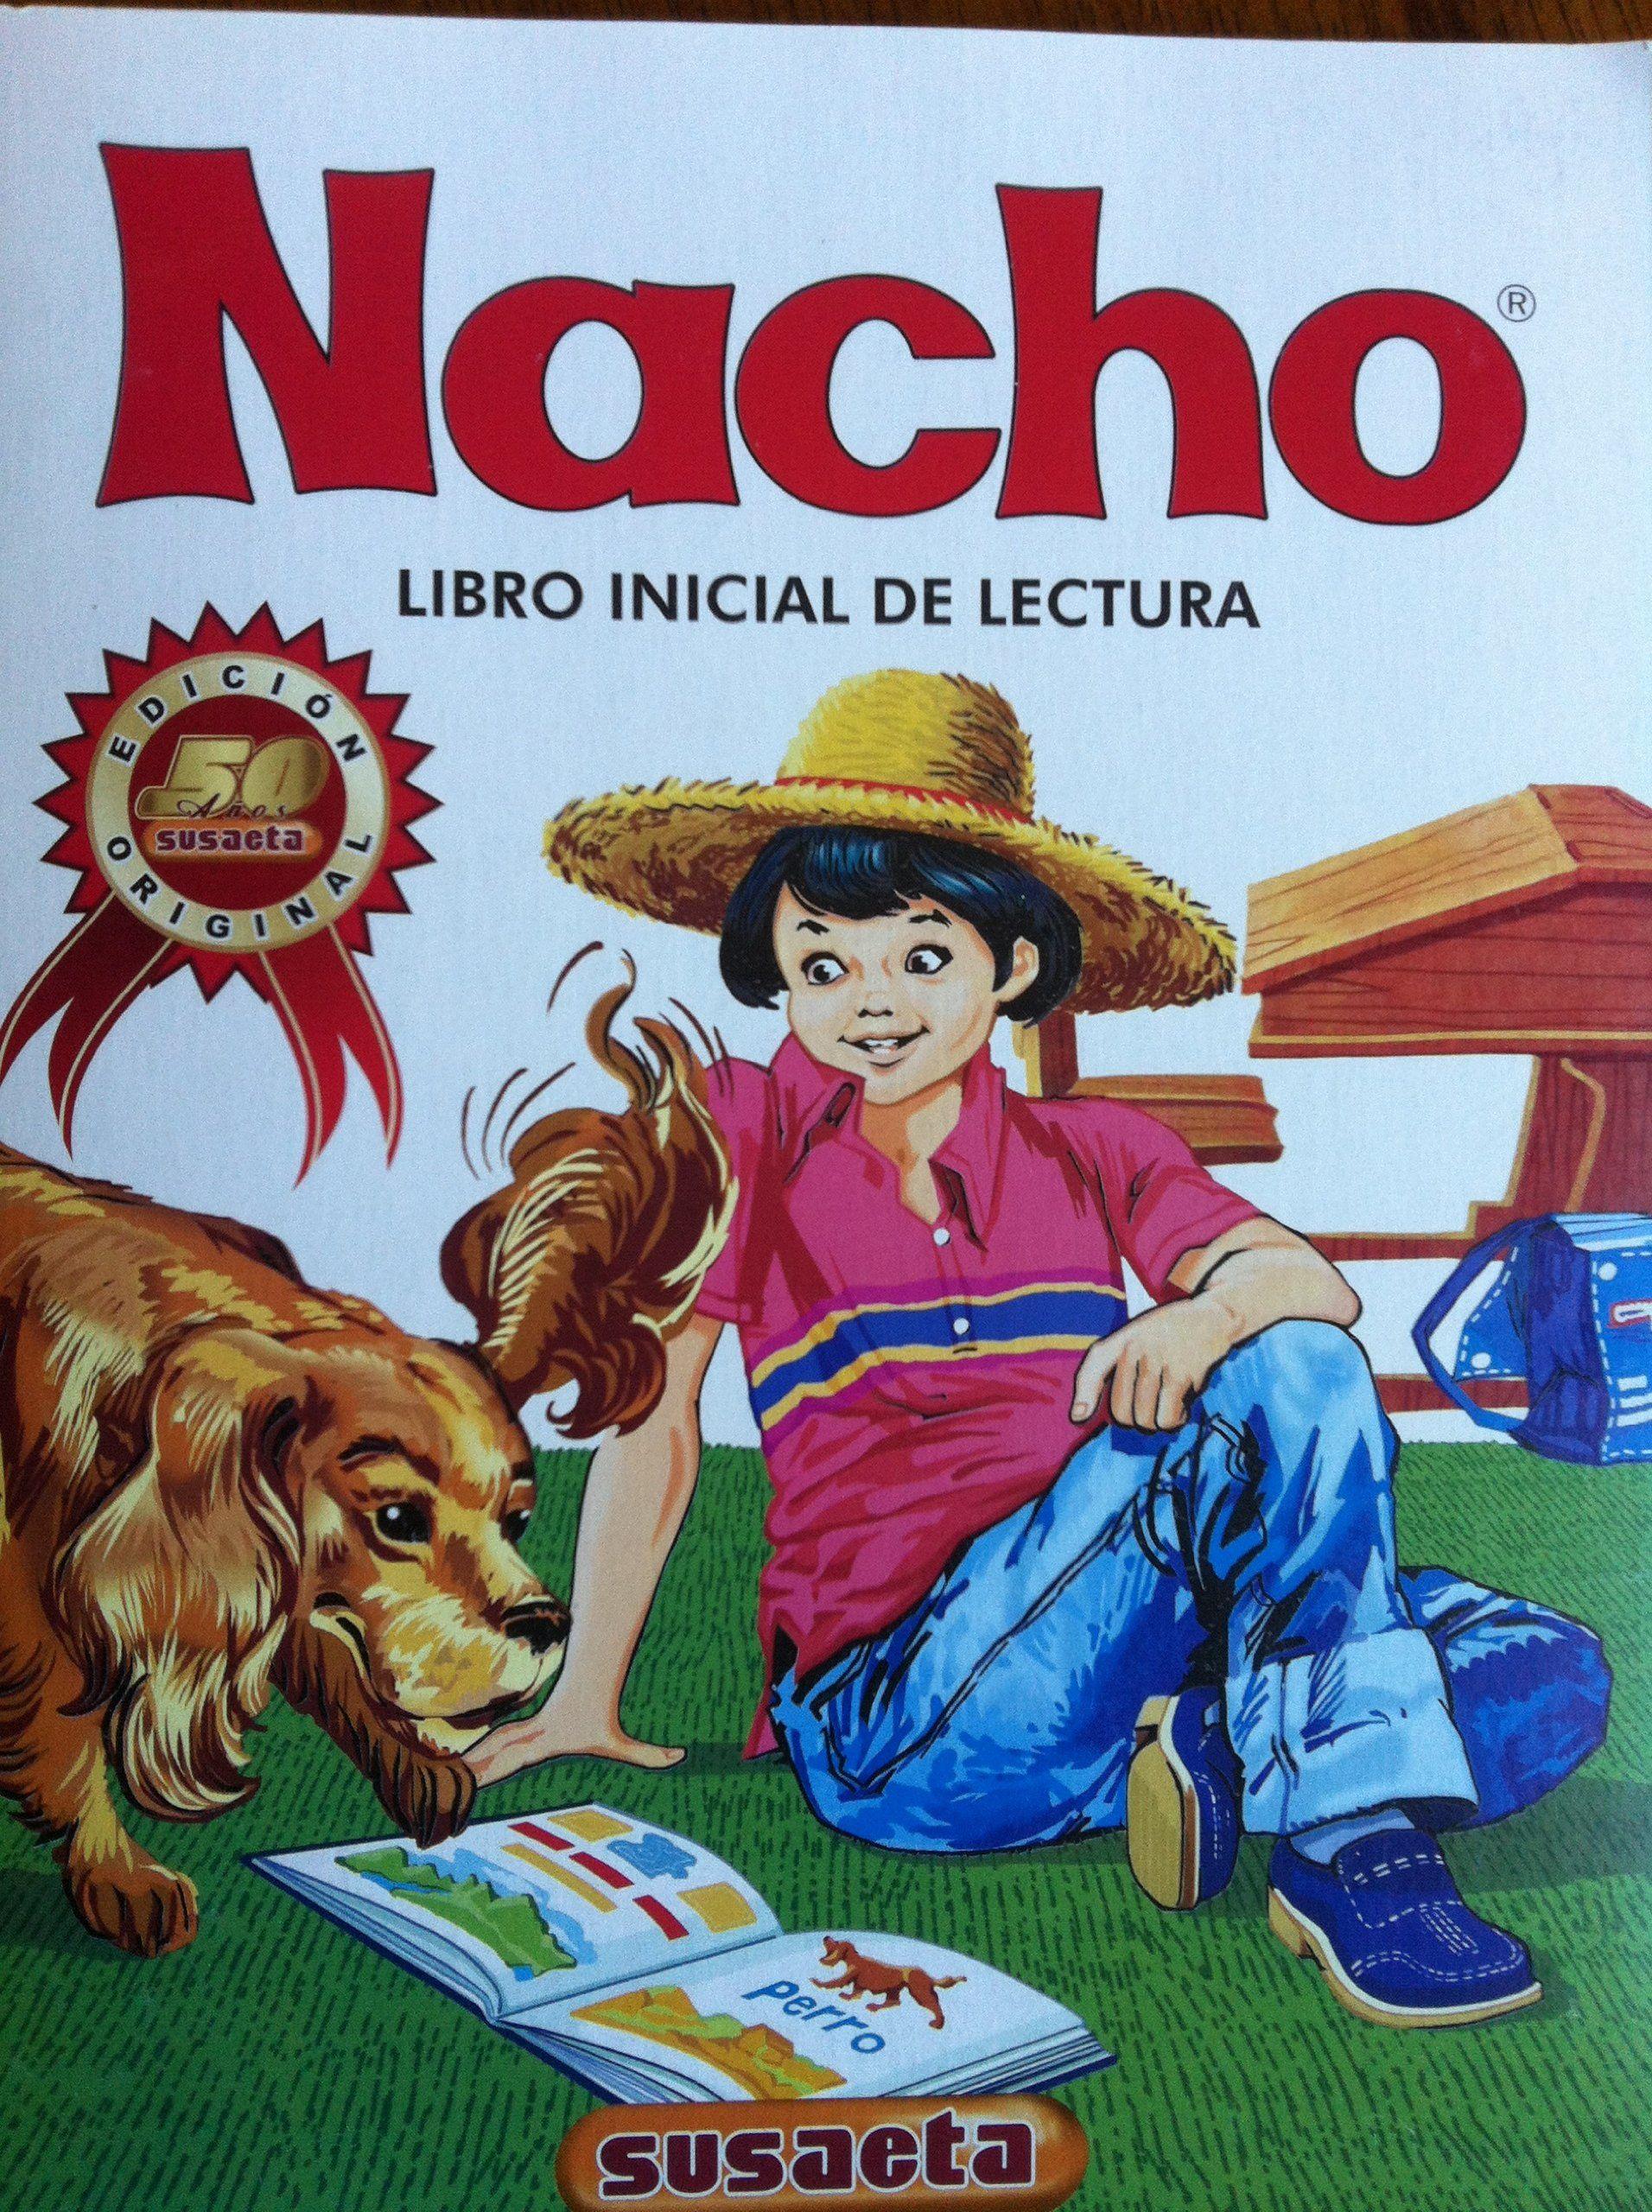 Nacho Libro Inicial De Lectura Coleccion Nacho Jorge